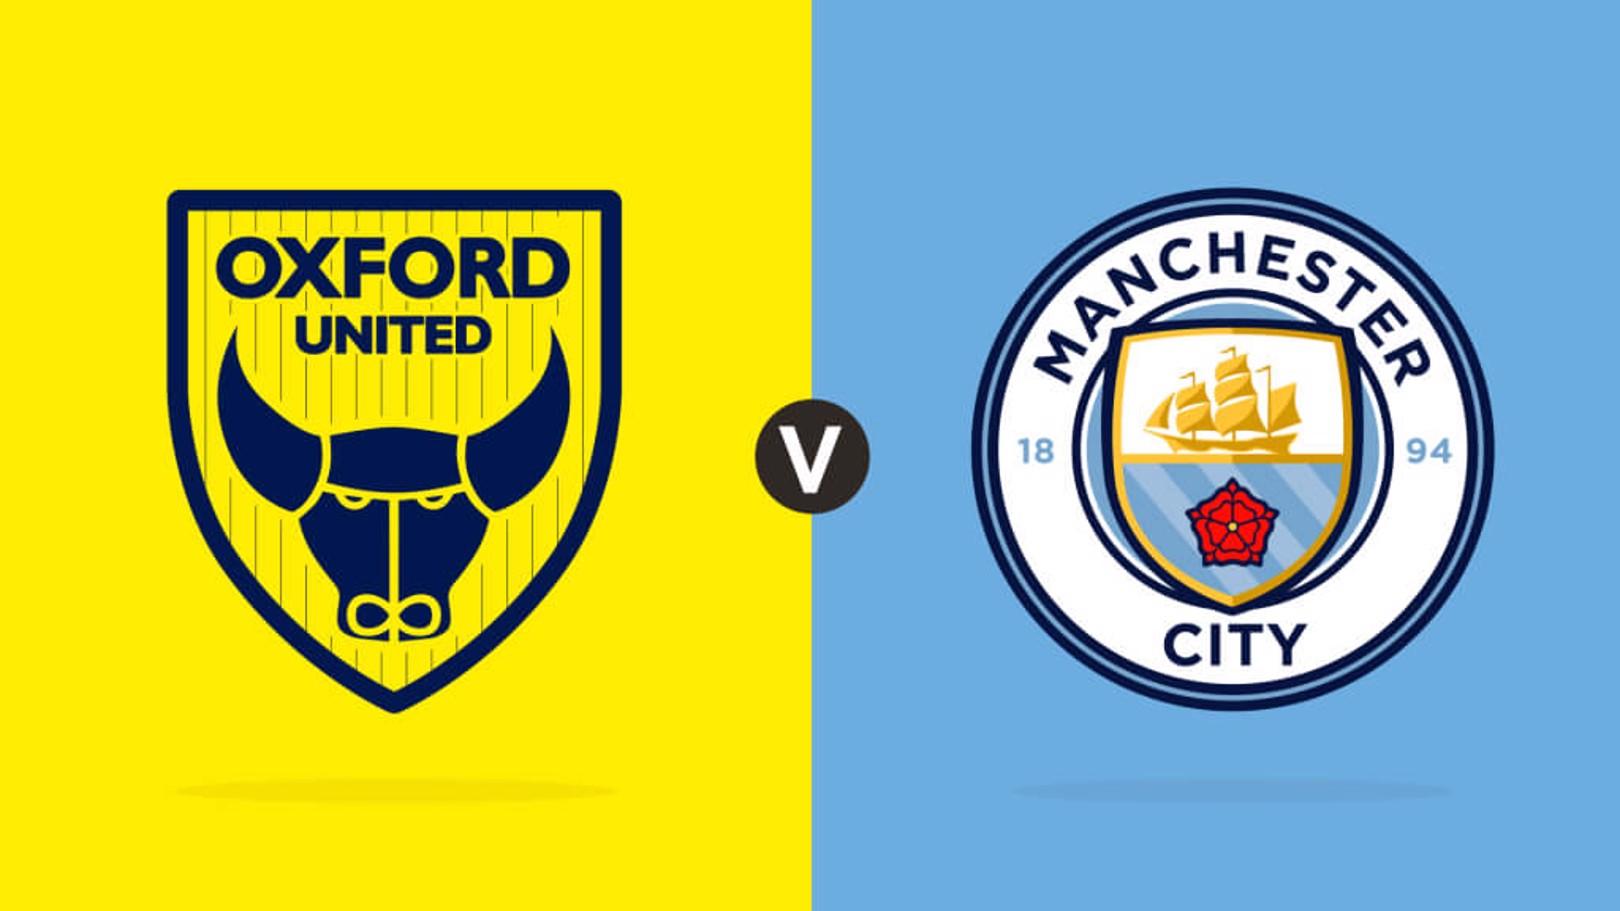 Oxford United v Manchester City : LIVE MATCH DAY!